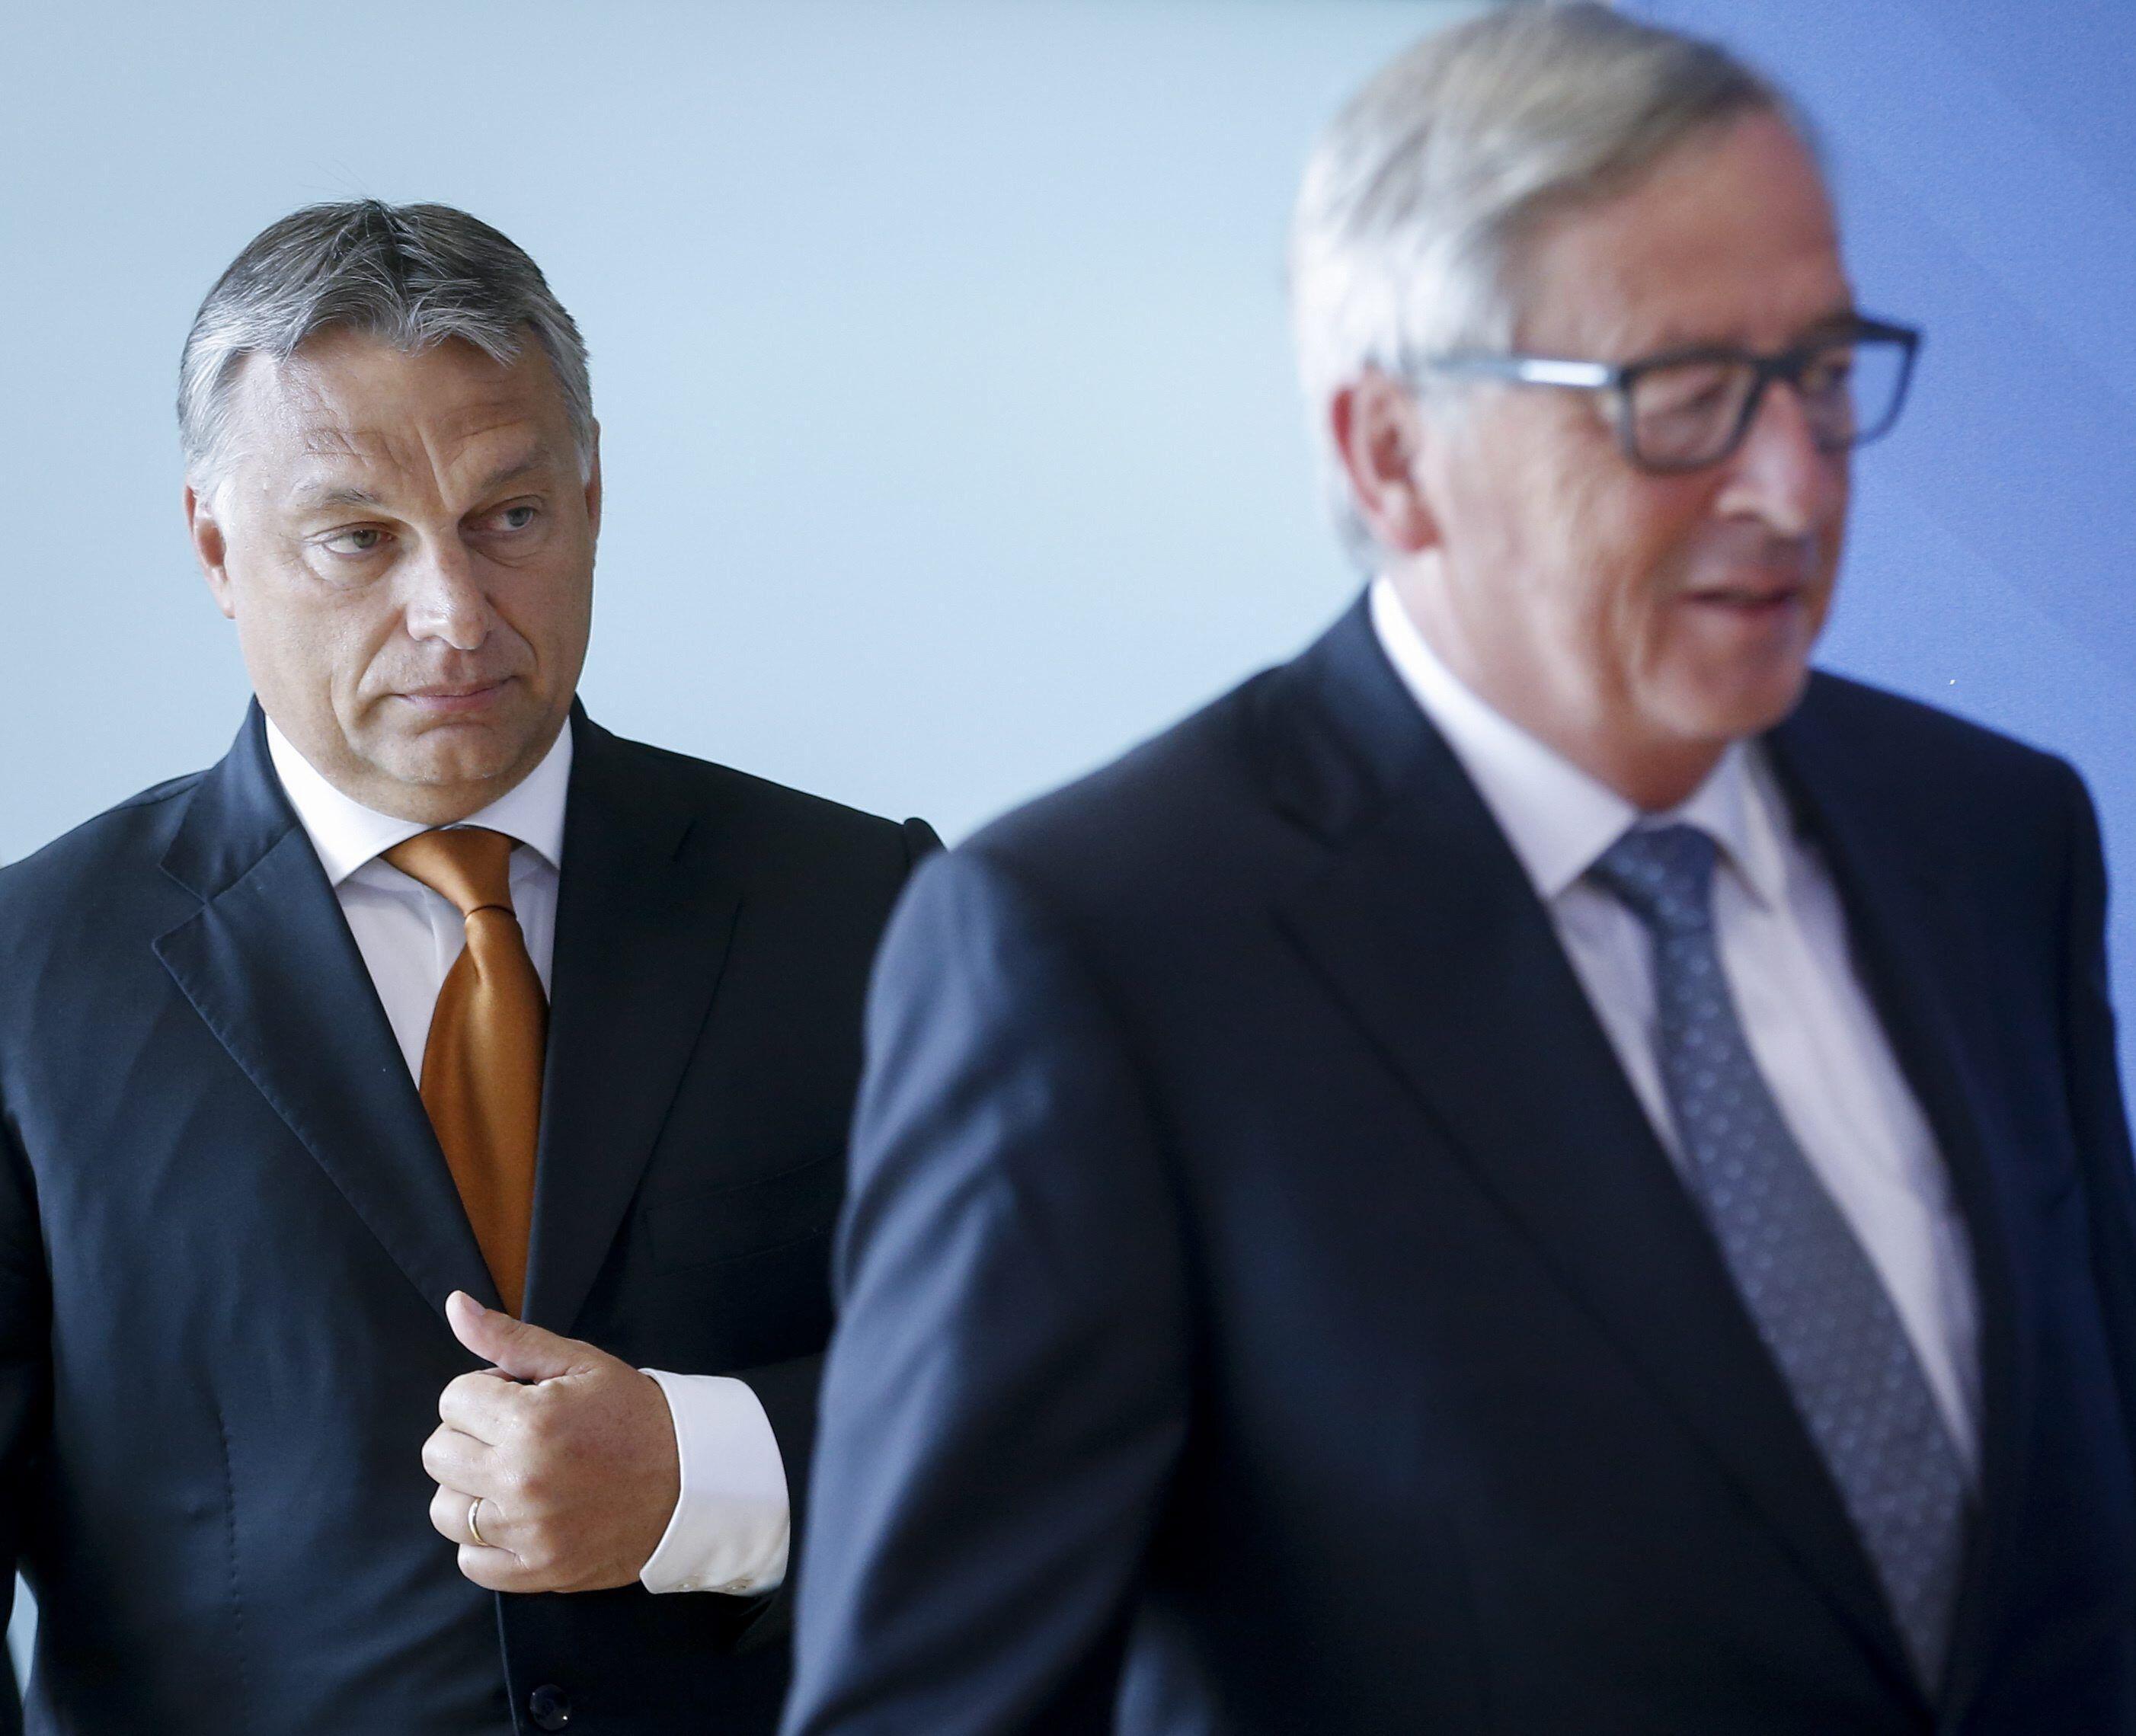 Bild zu Viktor Orbán, Ungarn, EU, Jean-Claude Juncker, Fidesz, EVP, Frank Engel, Migration, Luxemburg